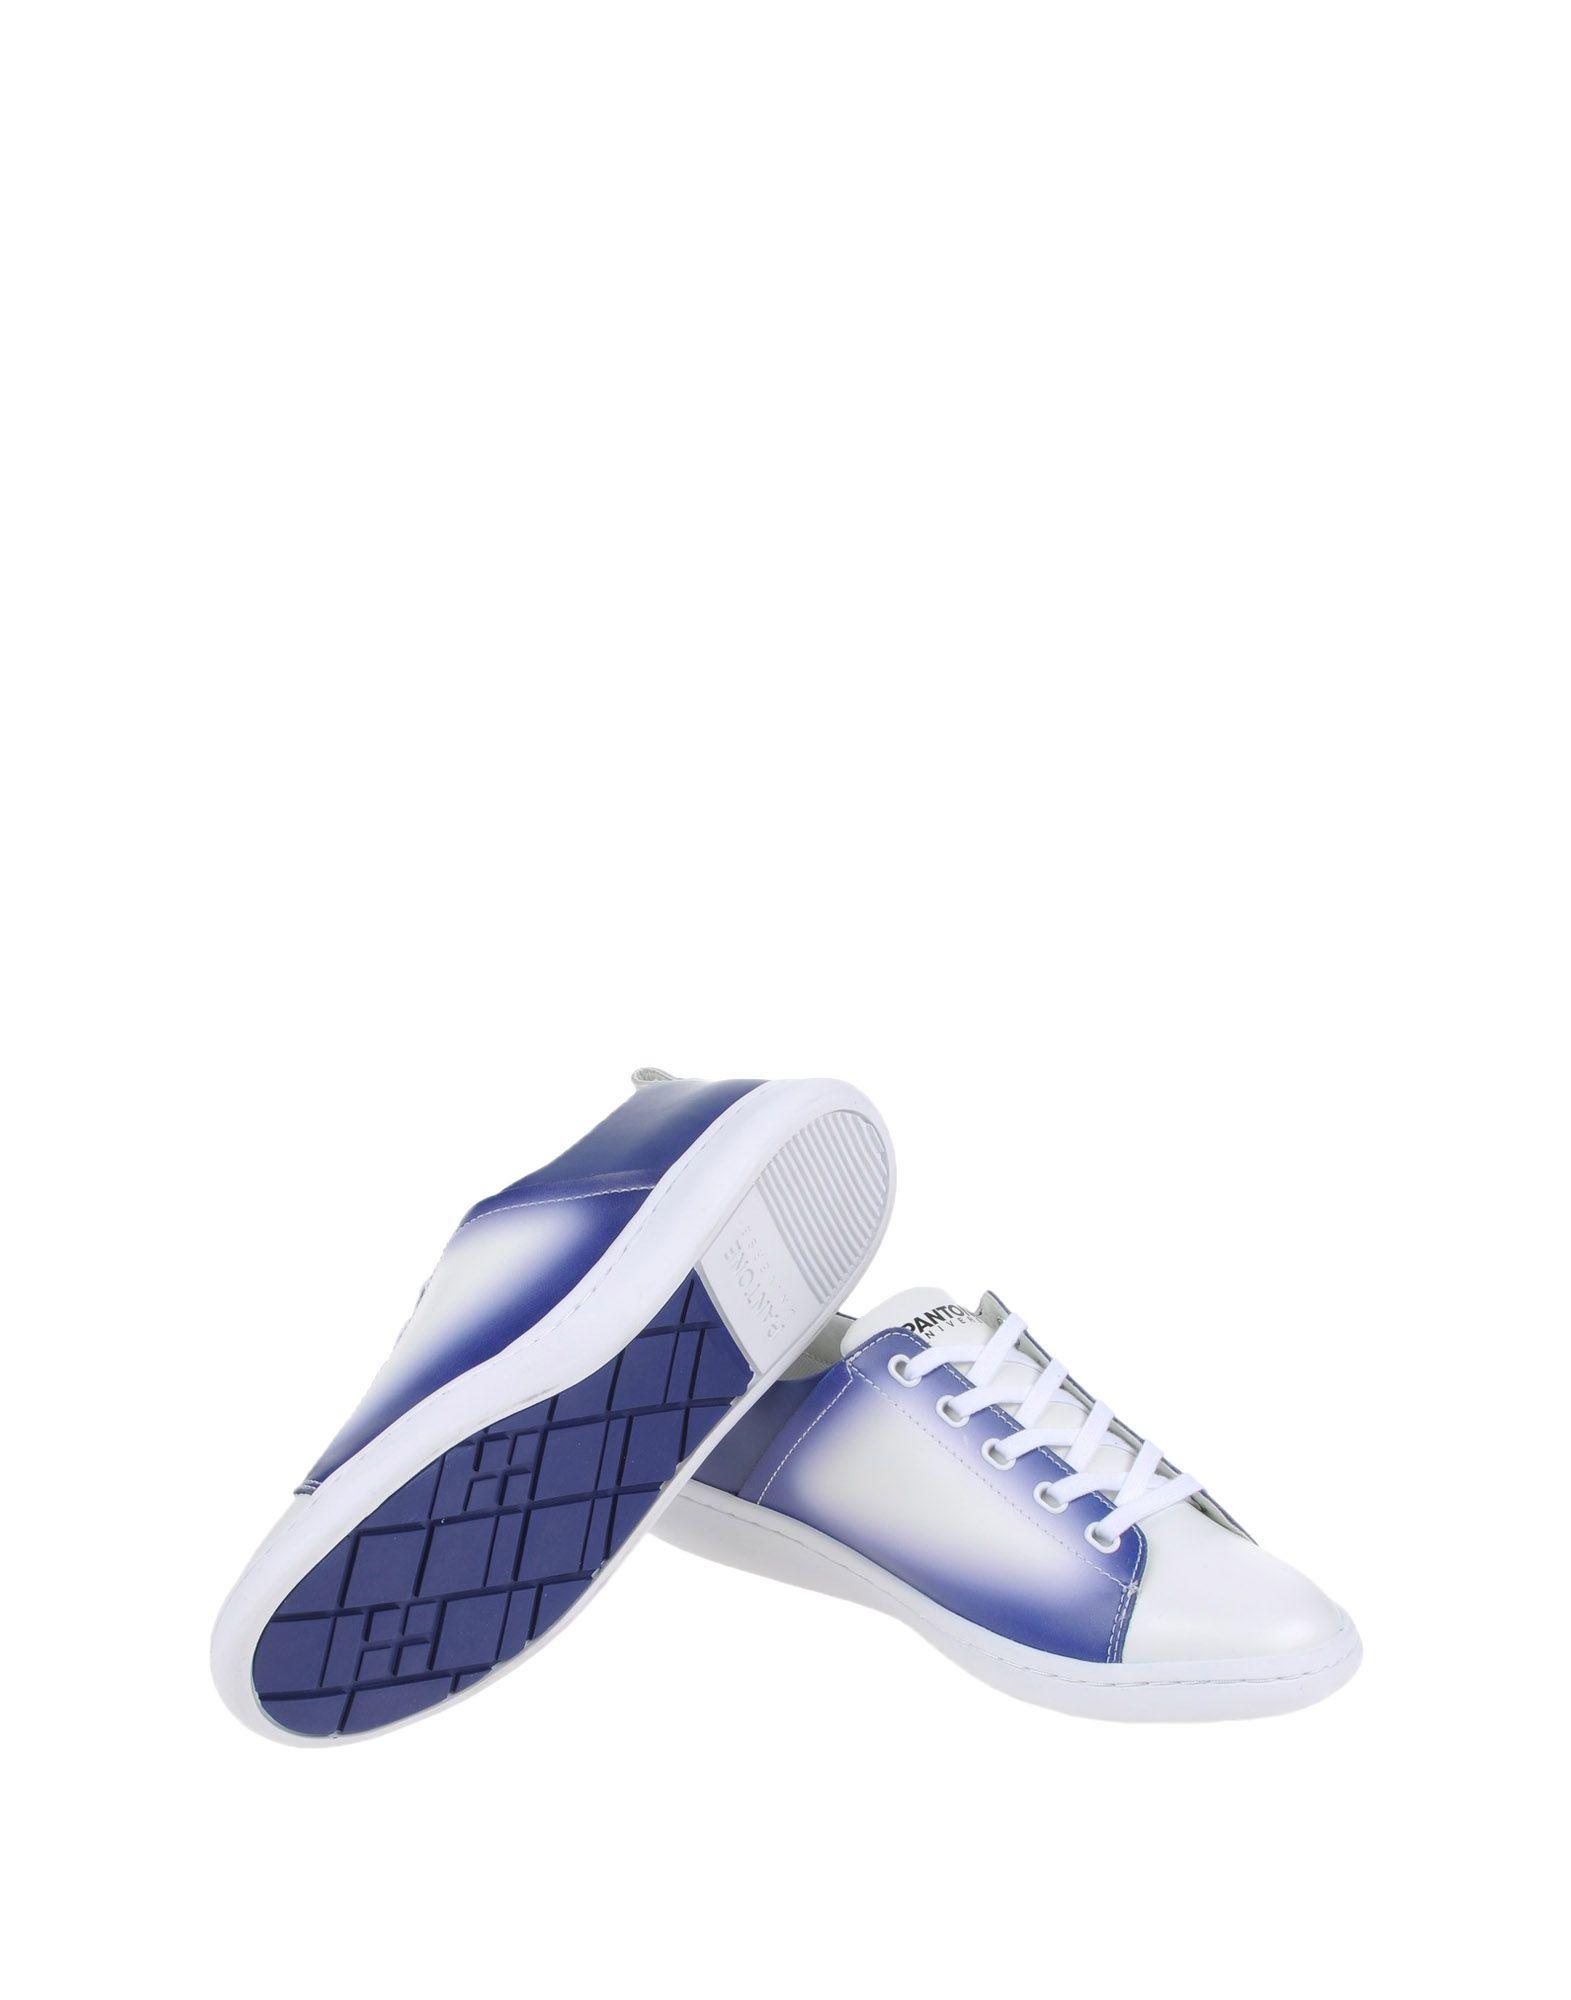 Sneakers Pantone Universe Footwear Australian Open - Homme - Sneakers Pantone Universe Footwear sur